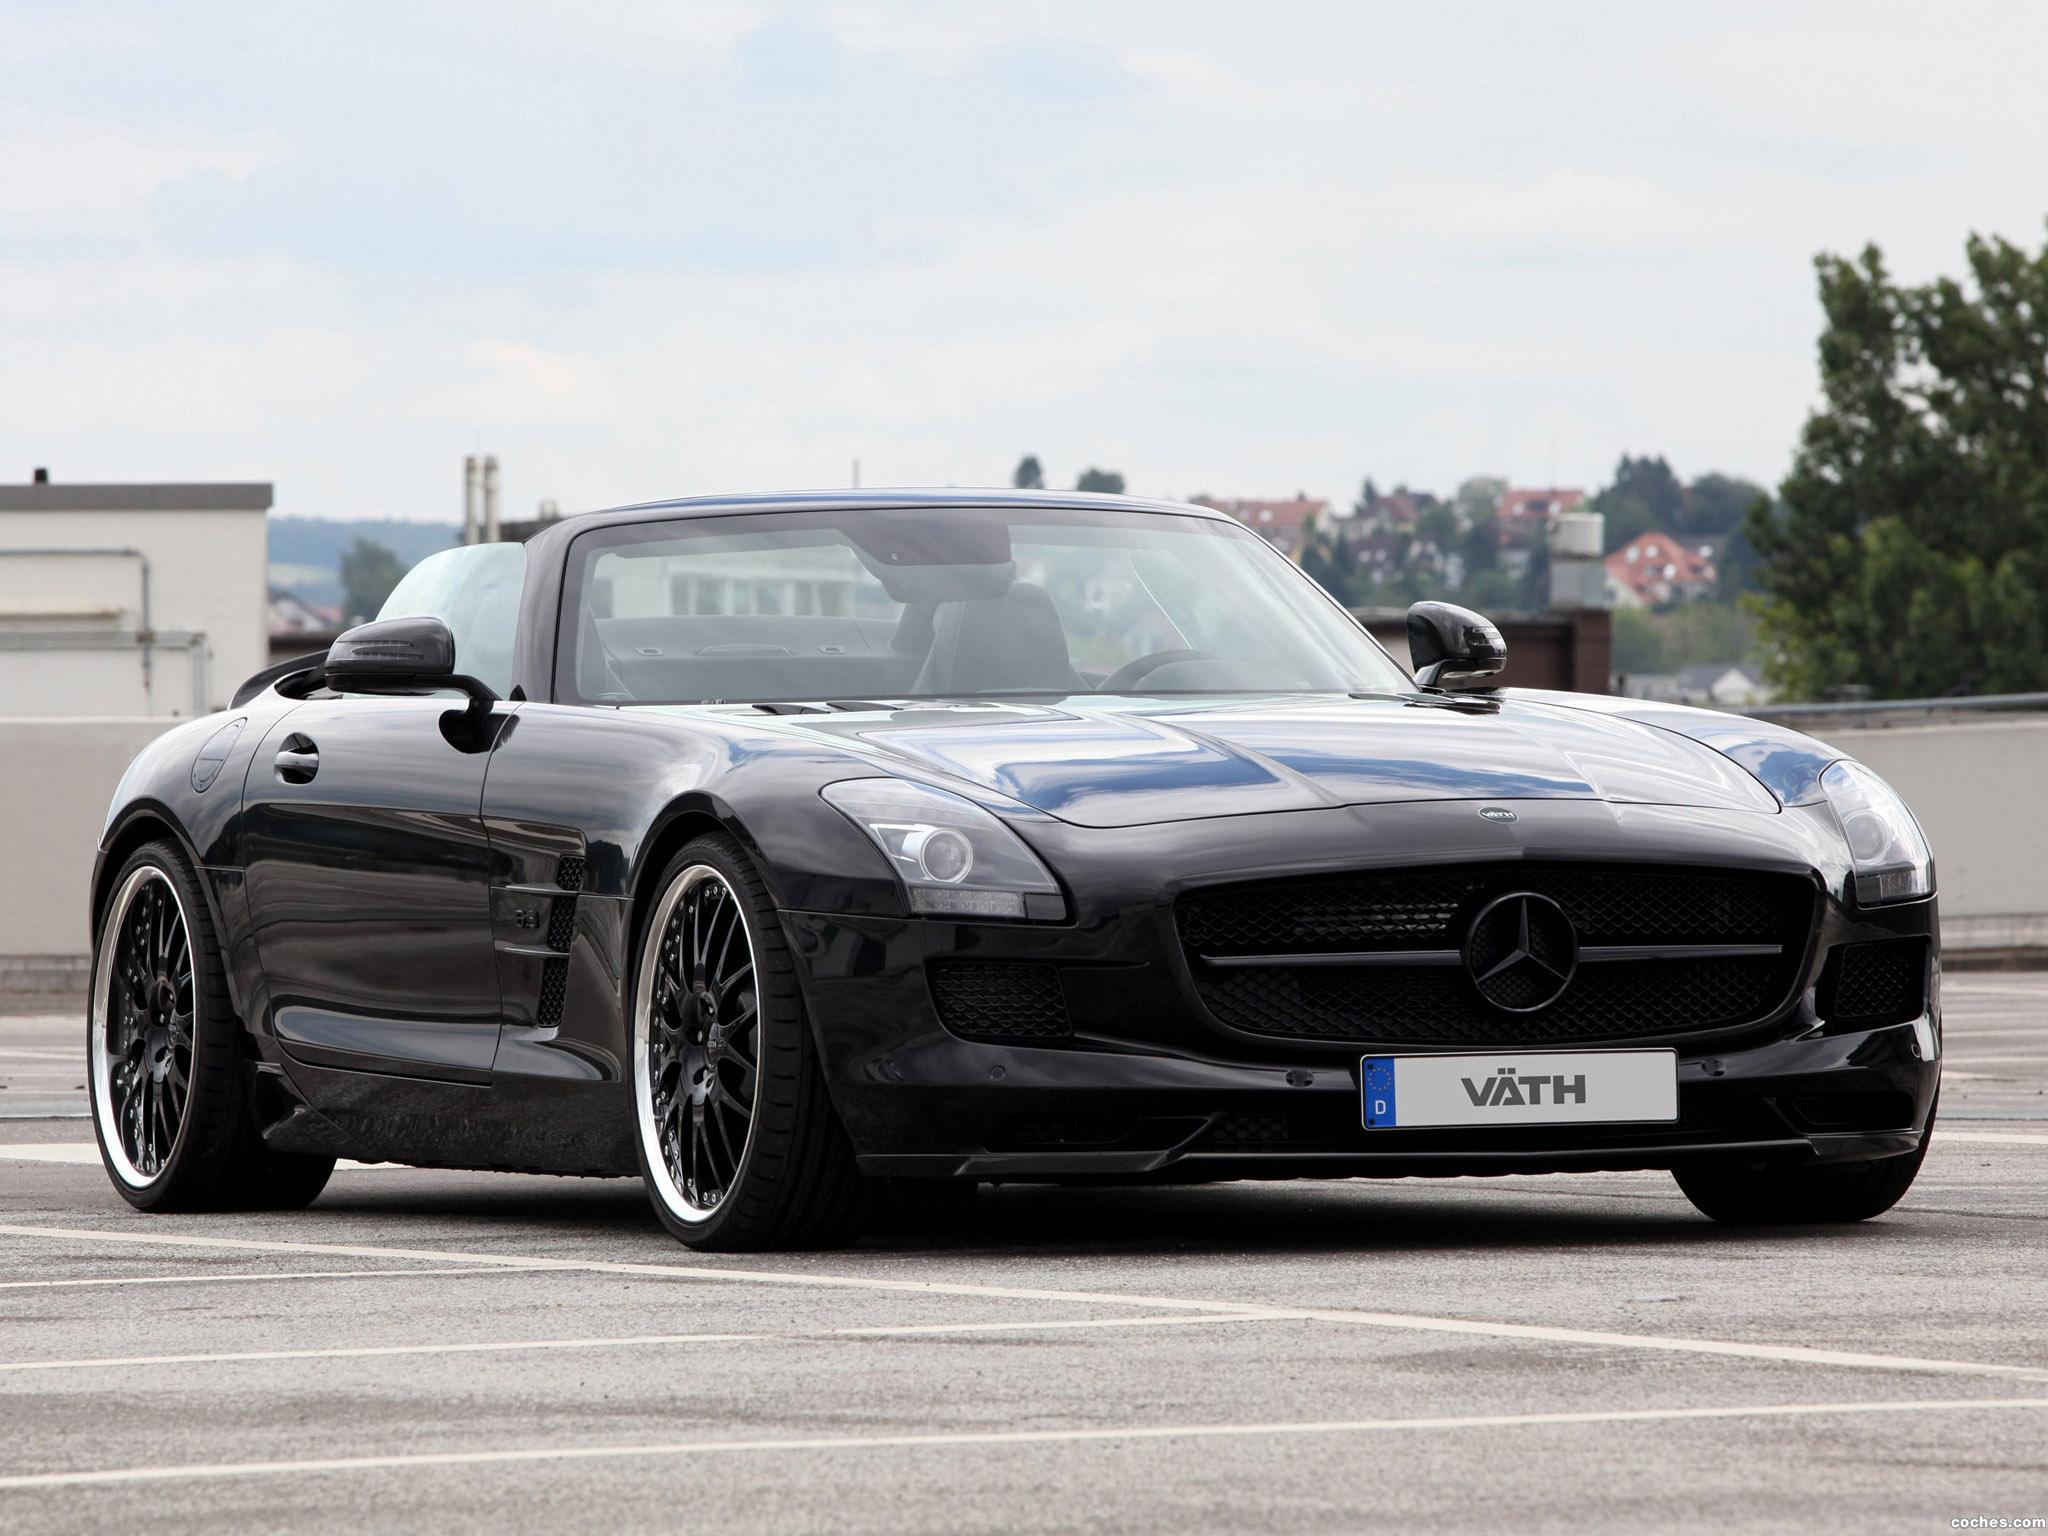 Foto 0 de Vath Mercedes AMG Clase SLS Roadster 2012